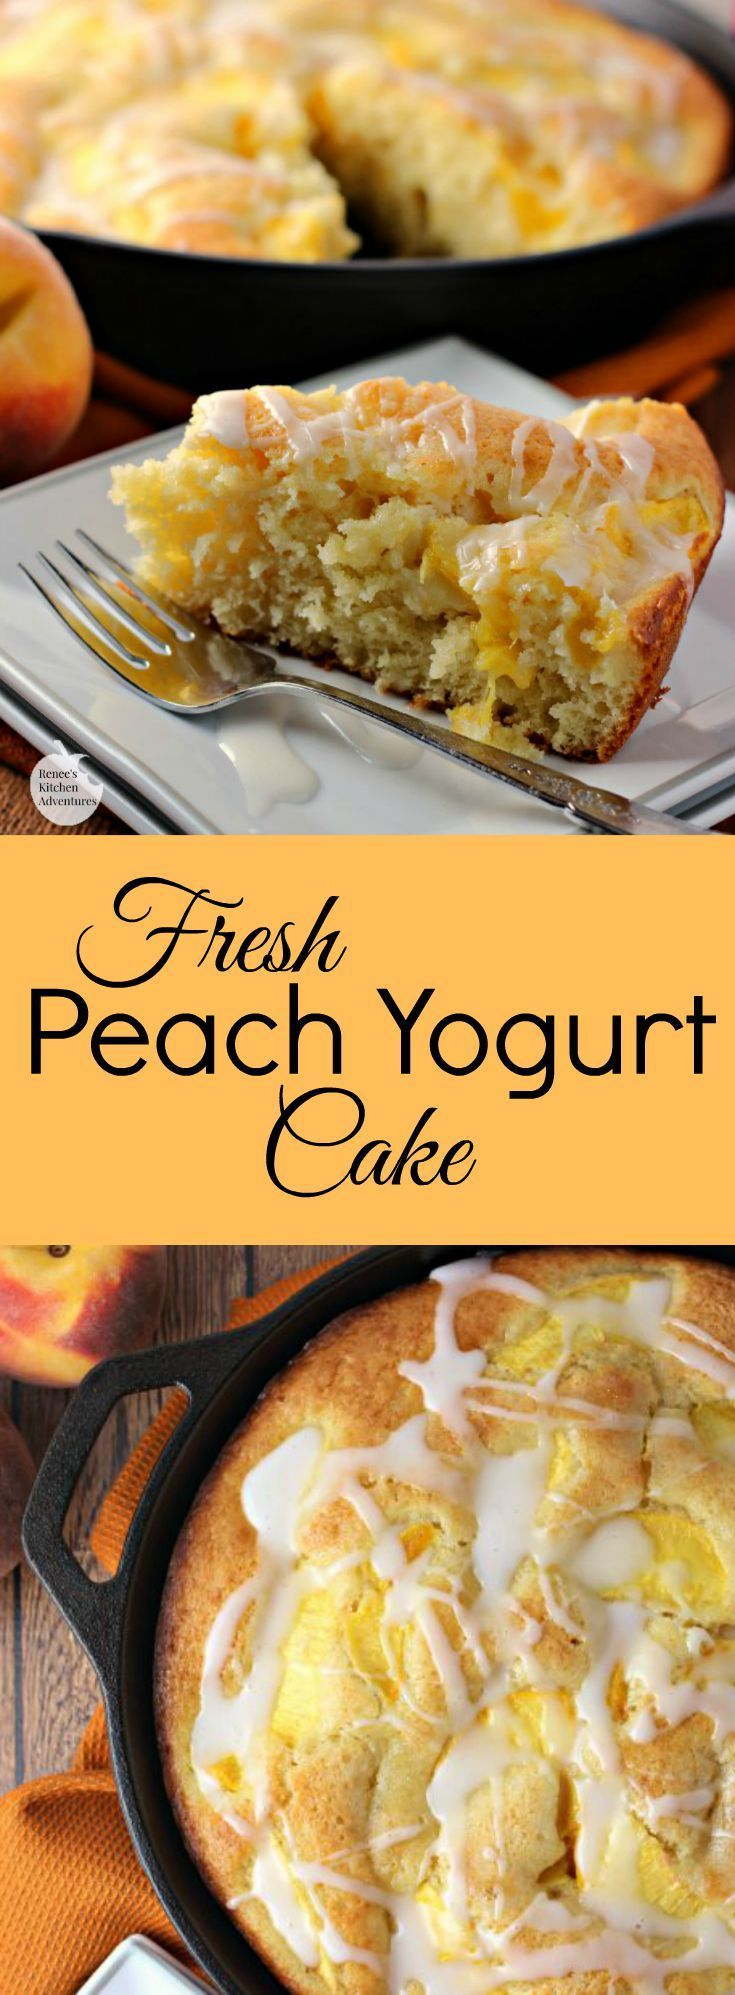 25+ bästa Peach yogurt cake idéerna på Pinterest